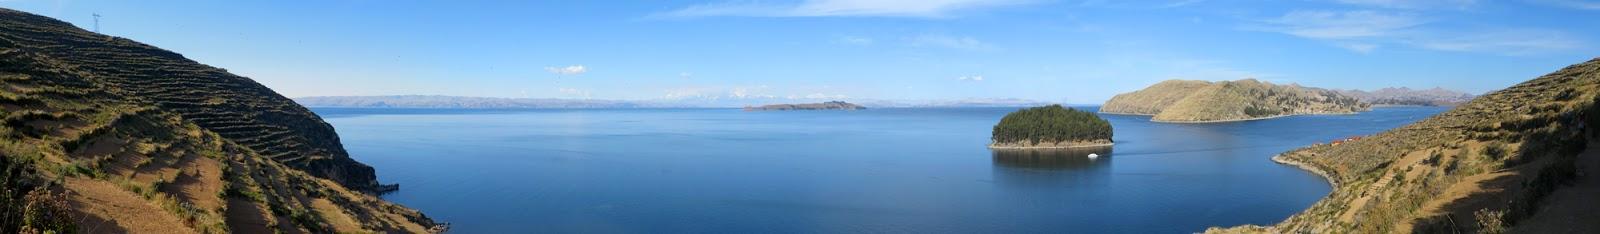 Lake Titicaca pano